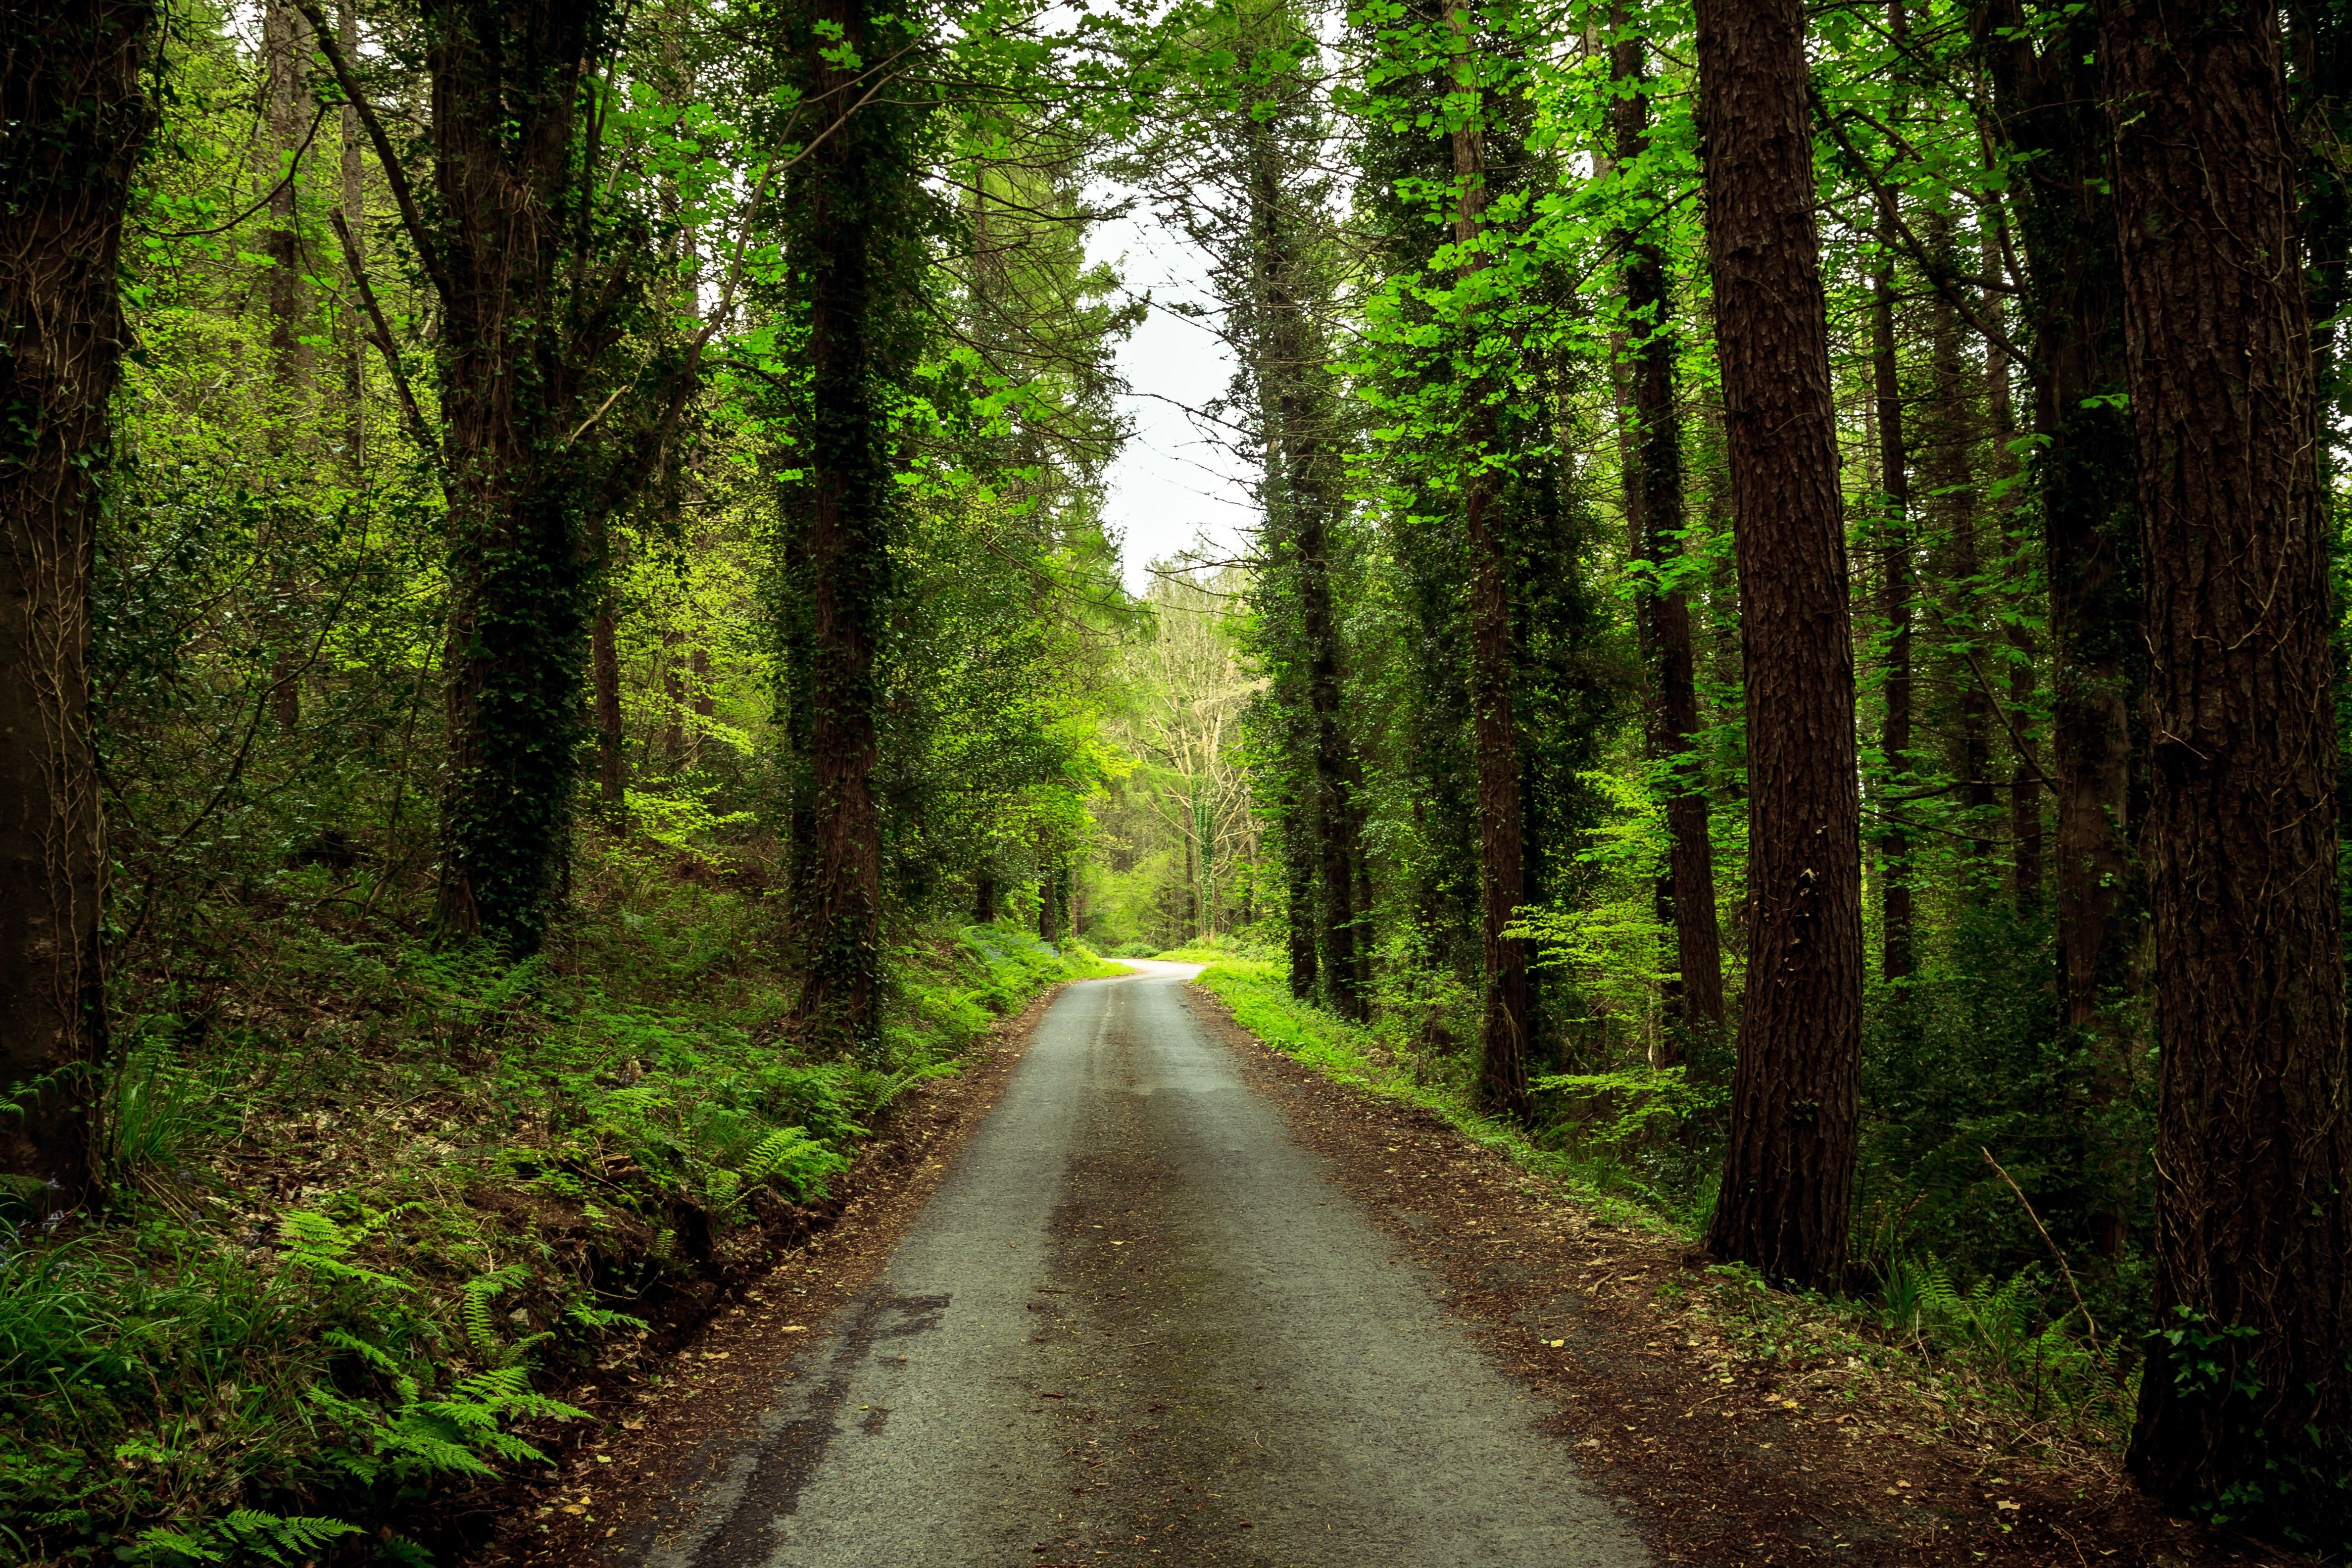 Forest Road Trees Landscape Wallpaper 4752x3168 453421